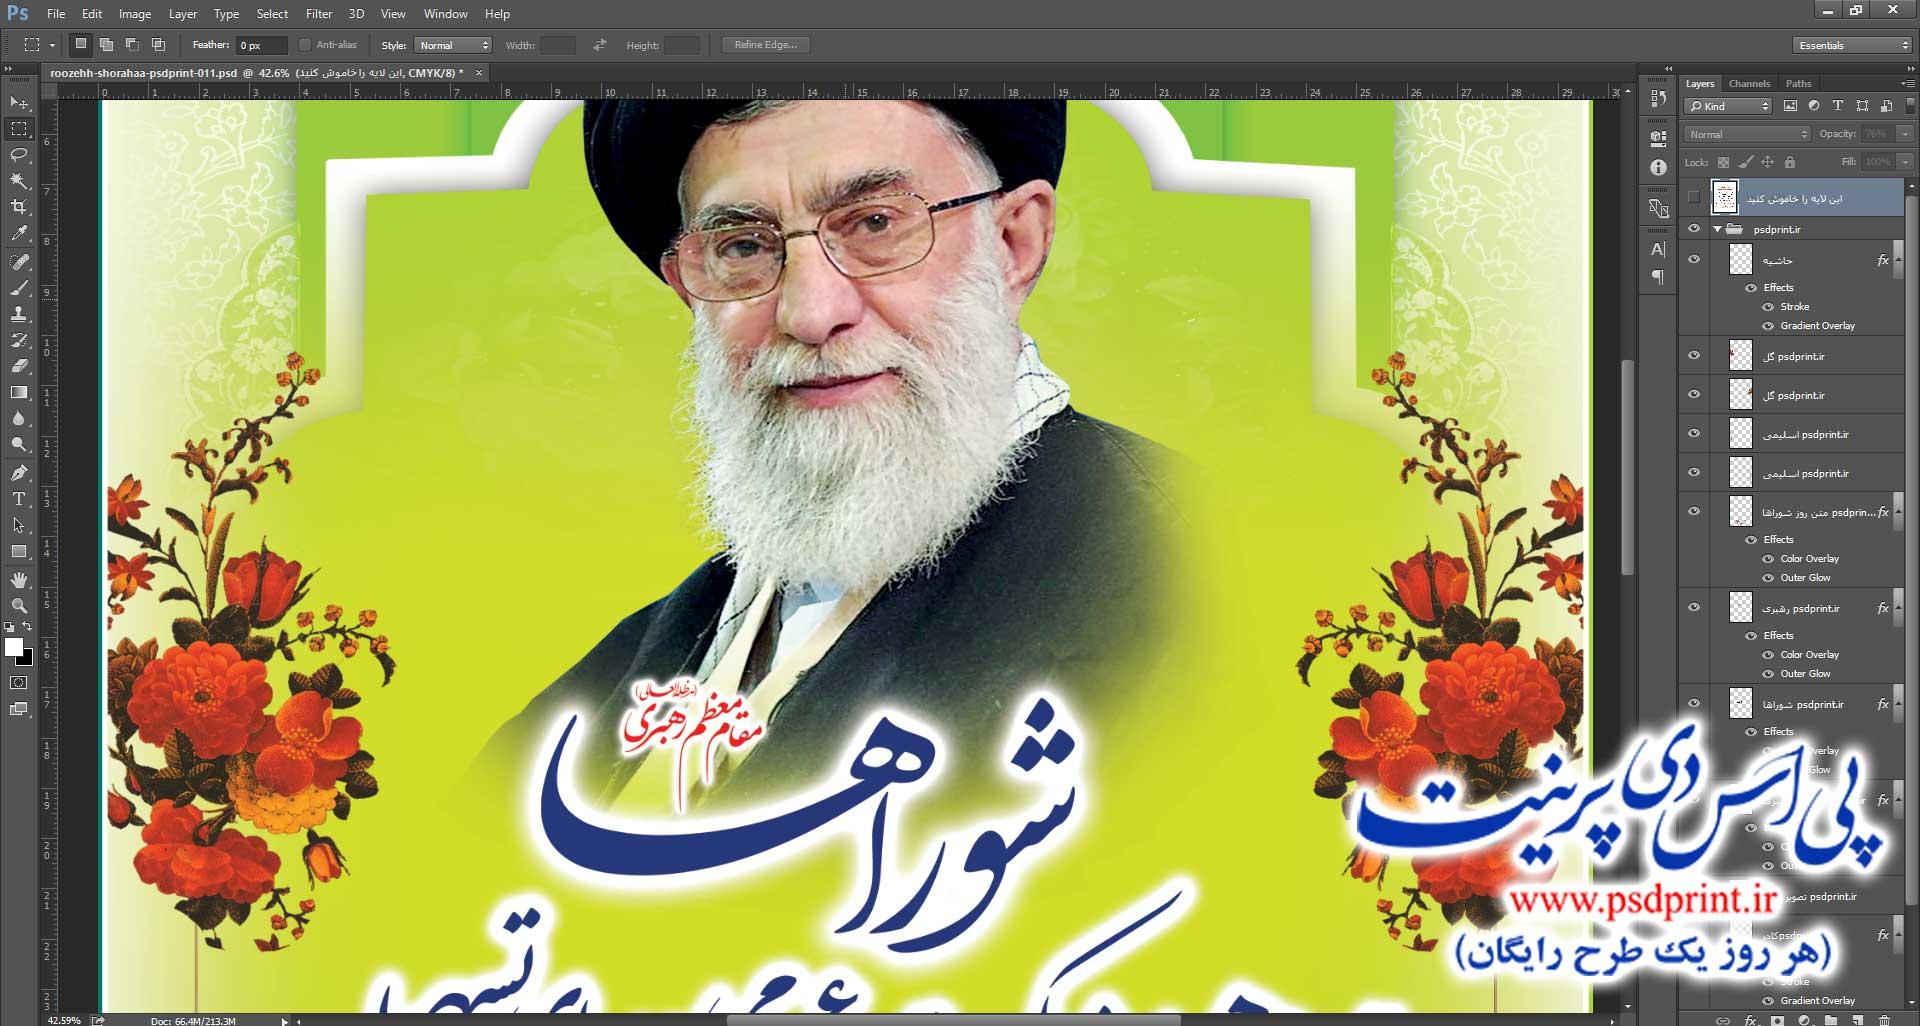 بنر تبریک روز شوراها